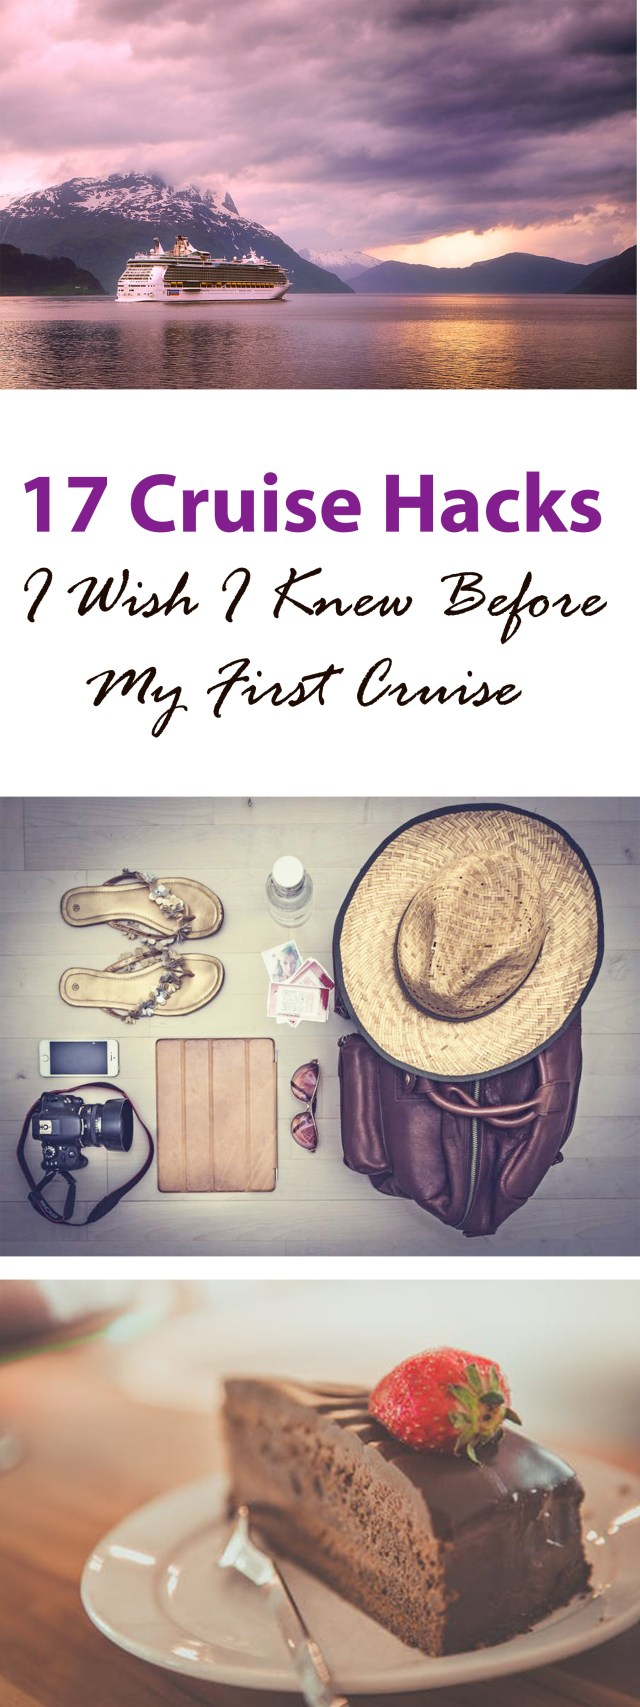 17 Cruise Hacks I Wish I Knew Before My First Cruise - have-kids